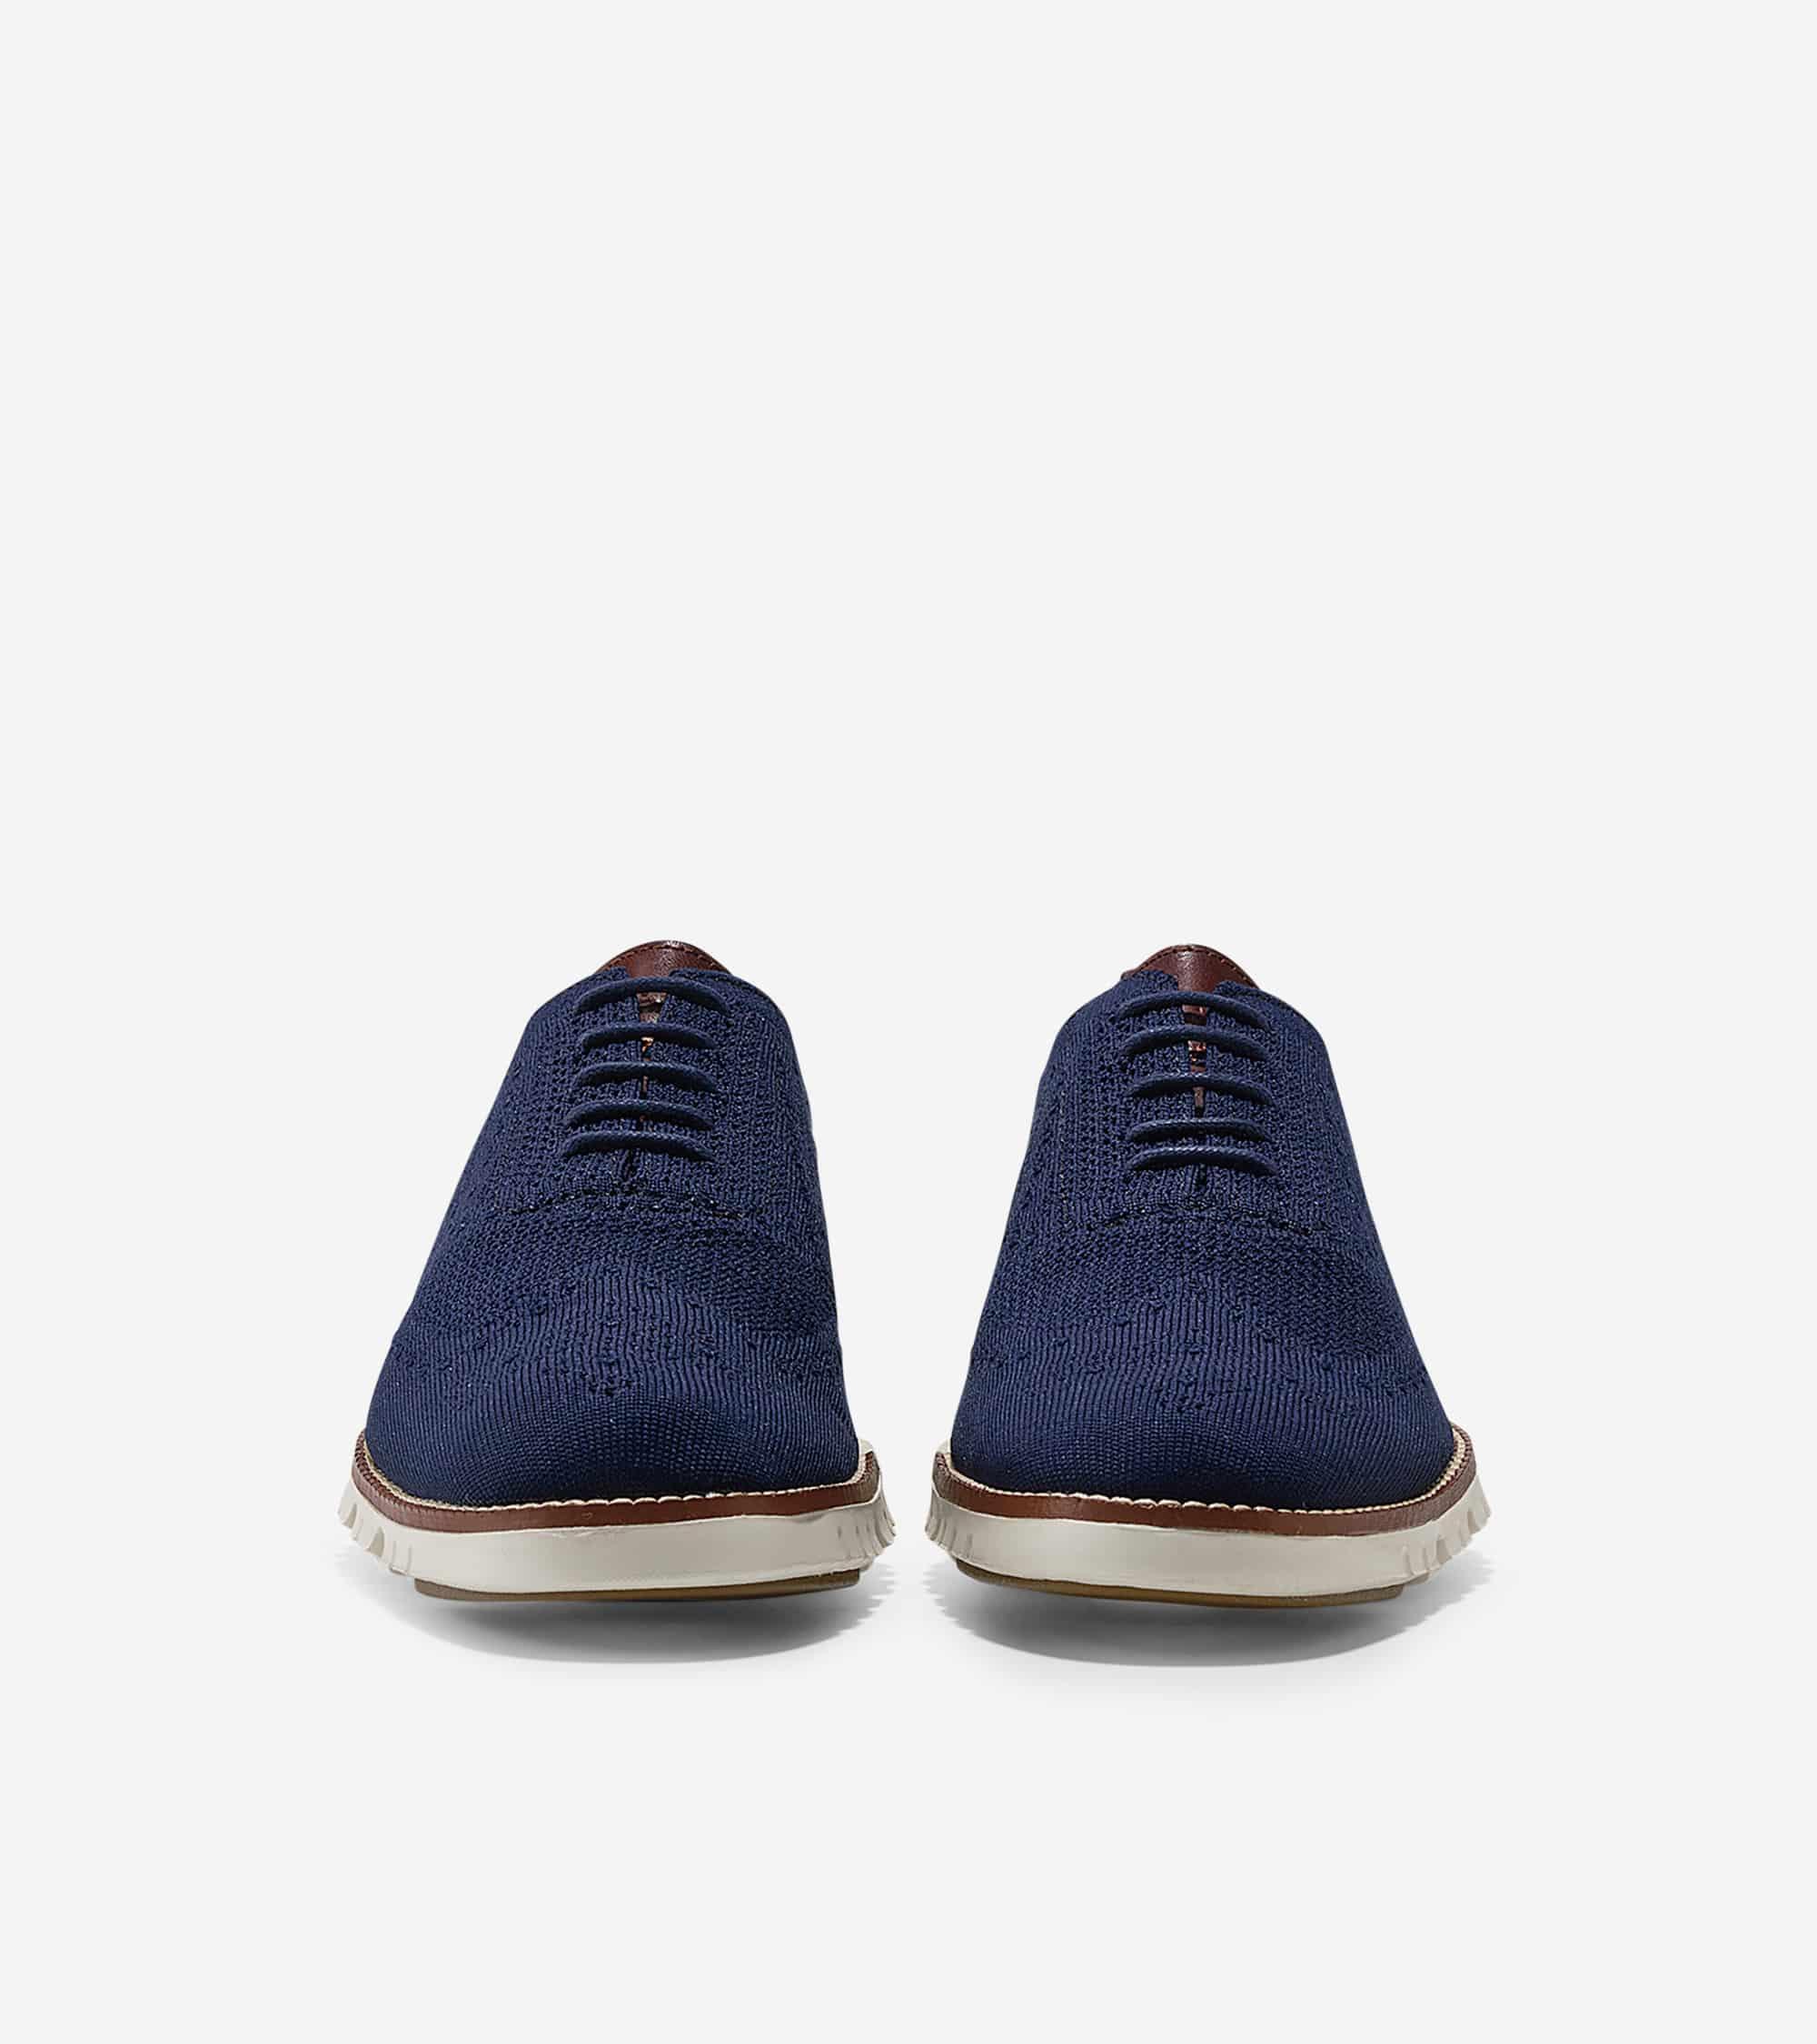 Cole Haan ZERØGRAND Stitchlite Oxford Marine Blue Knit/Ivory